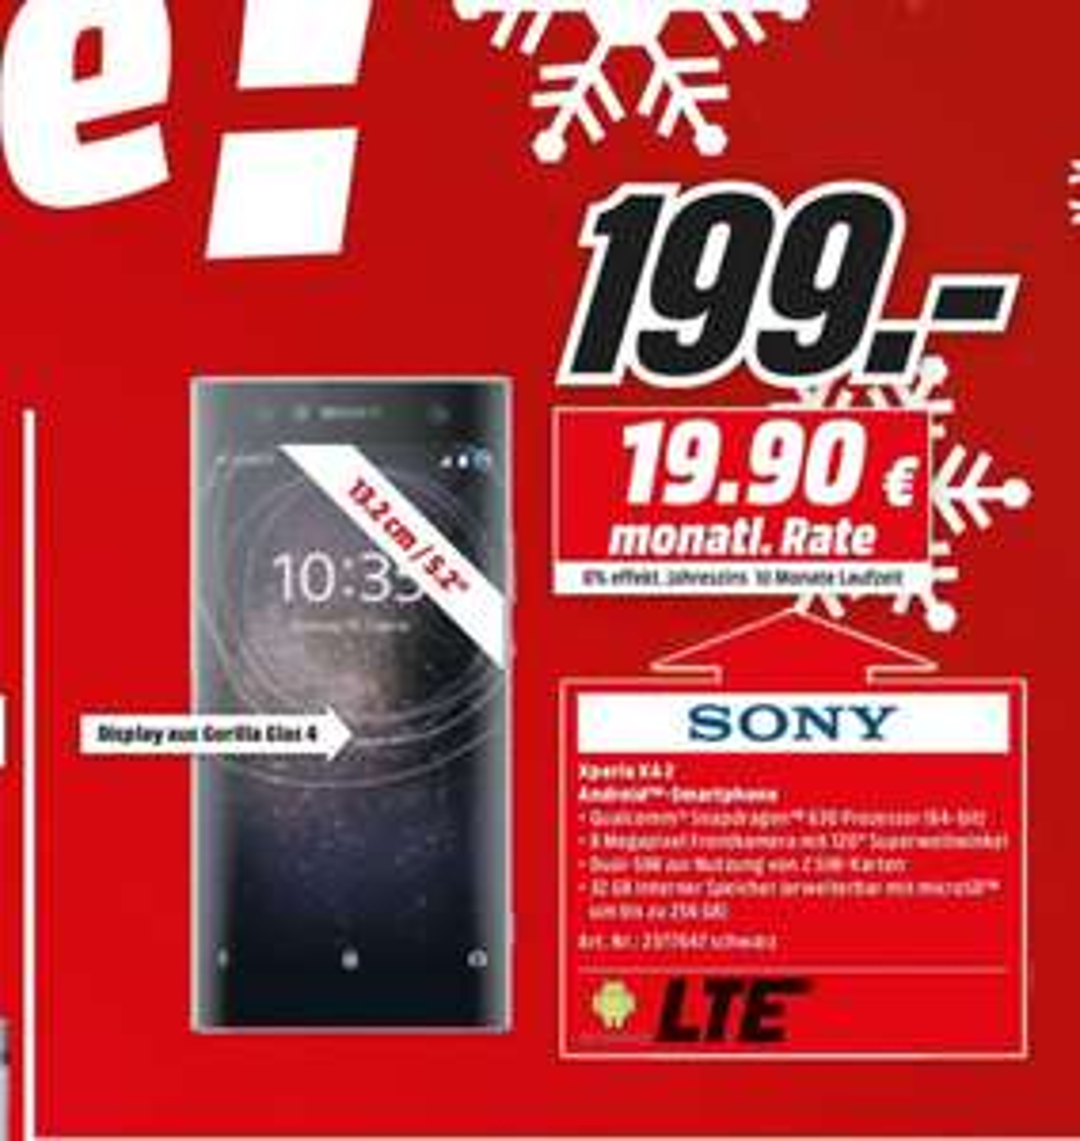 Sony Xperia XA2 Smartphone 5,2 Zoll Full HD für 199€ [Lokal Media Markt Zella-Mehlis]